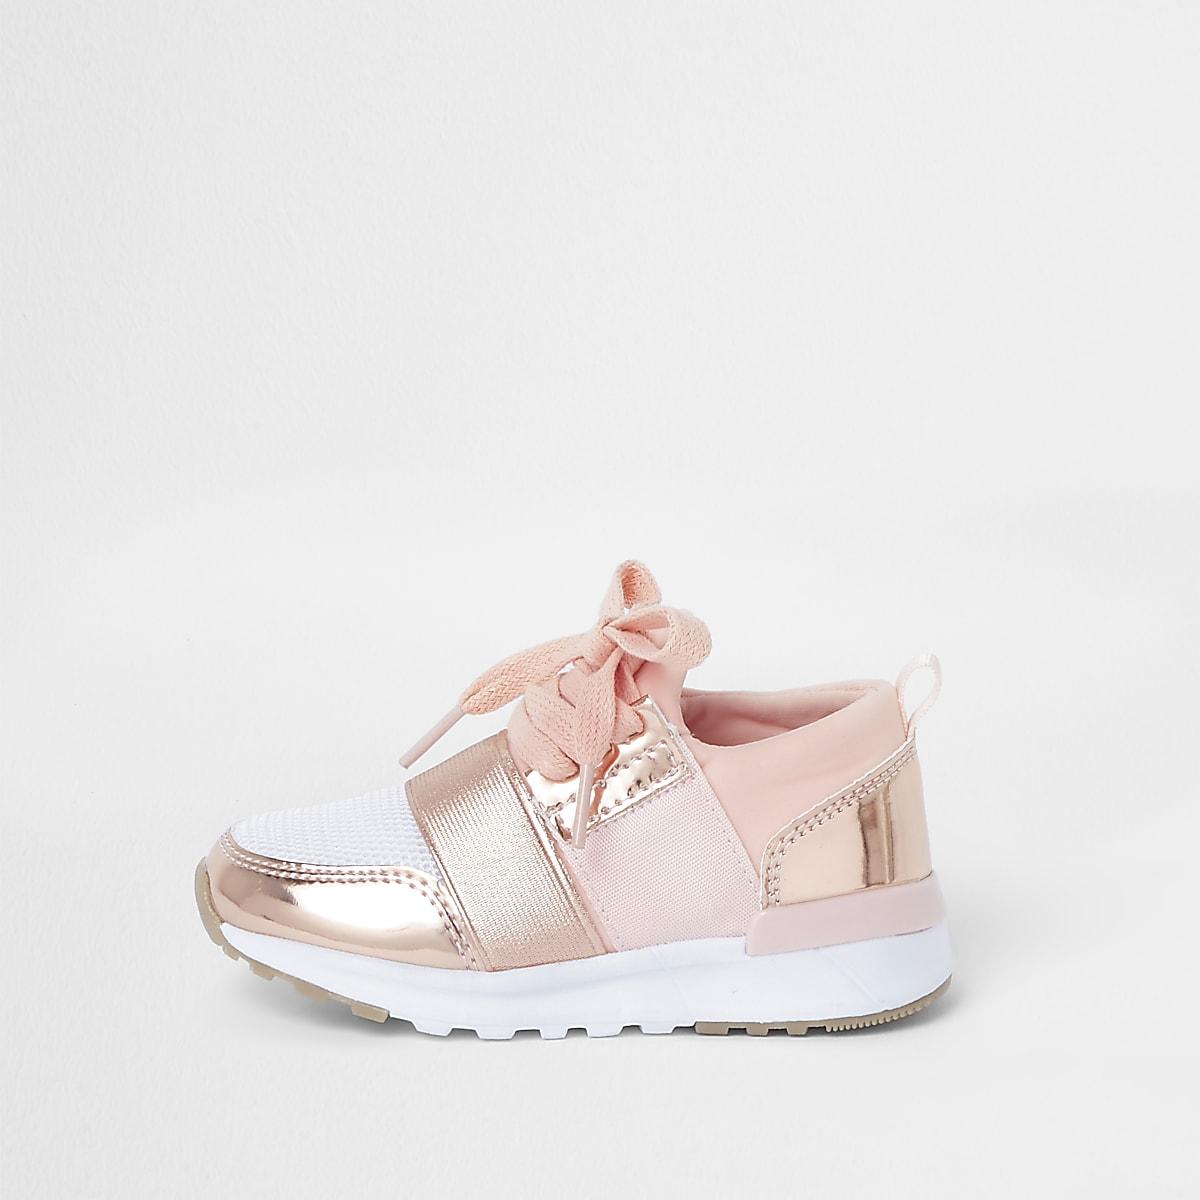 73cd847b1a26 Mini girls rose gold metallic runner trainers - Baby Girls Trainers - Baby  Girls Shoes   Boots - Mini Girls - girls